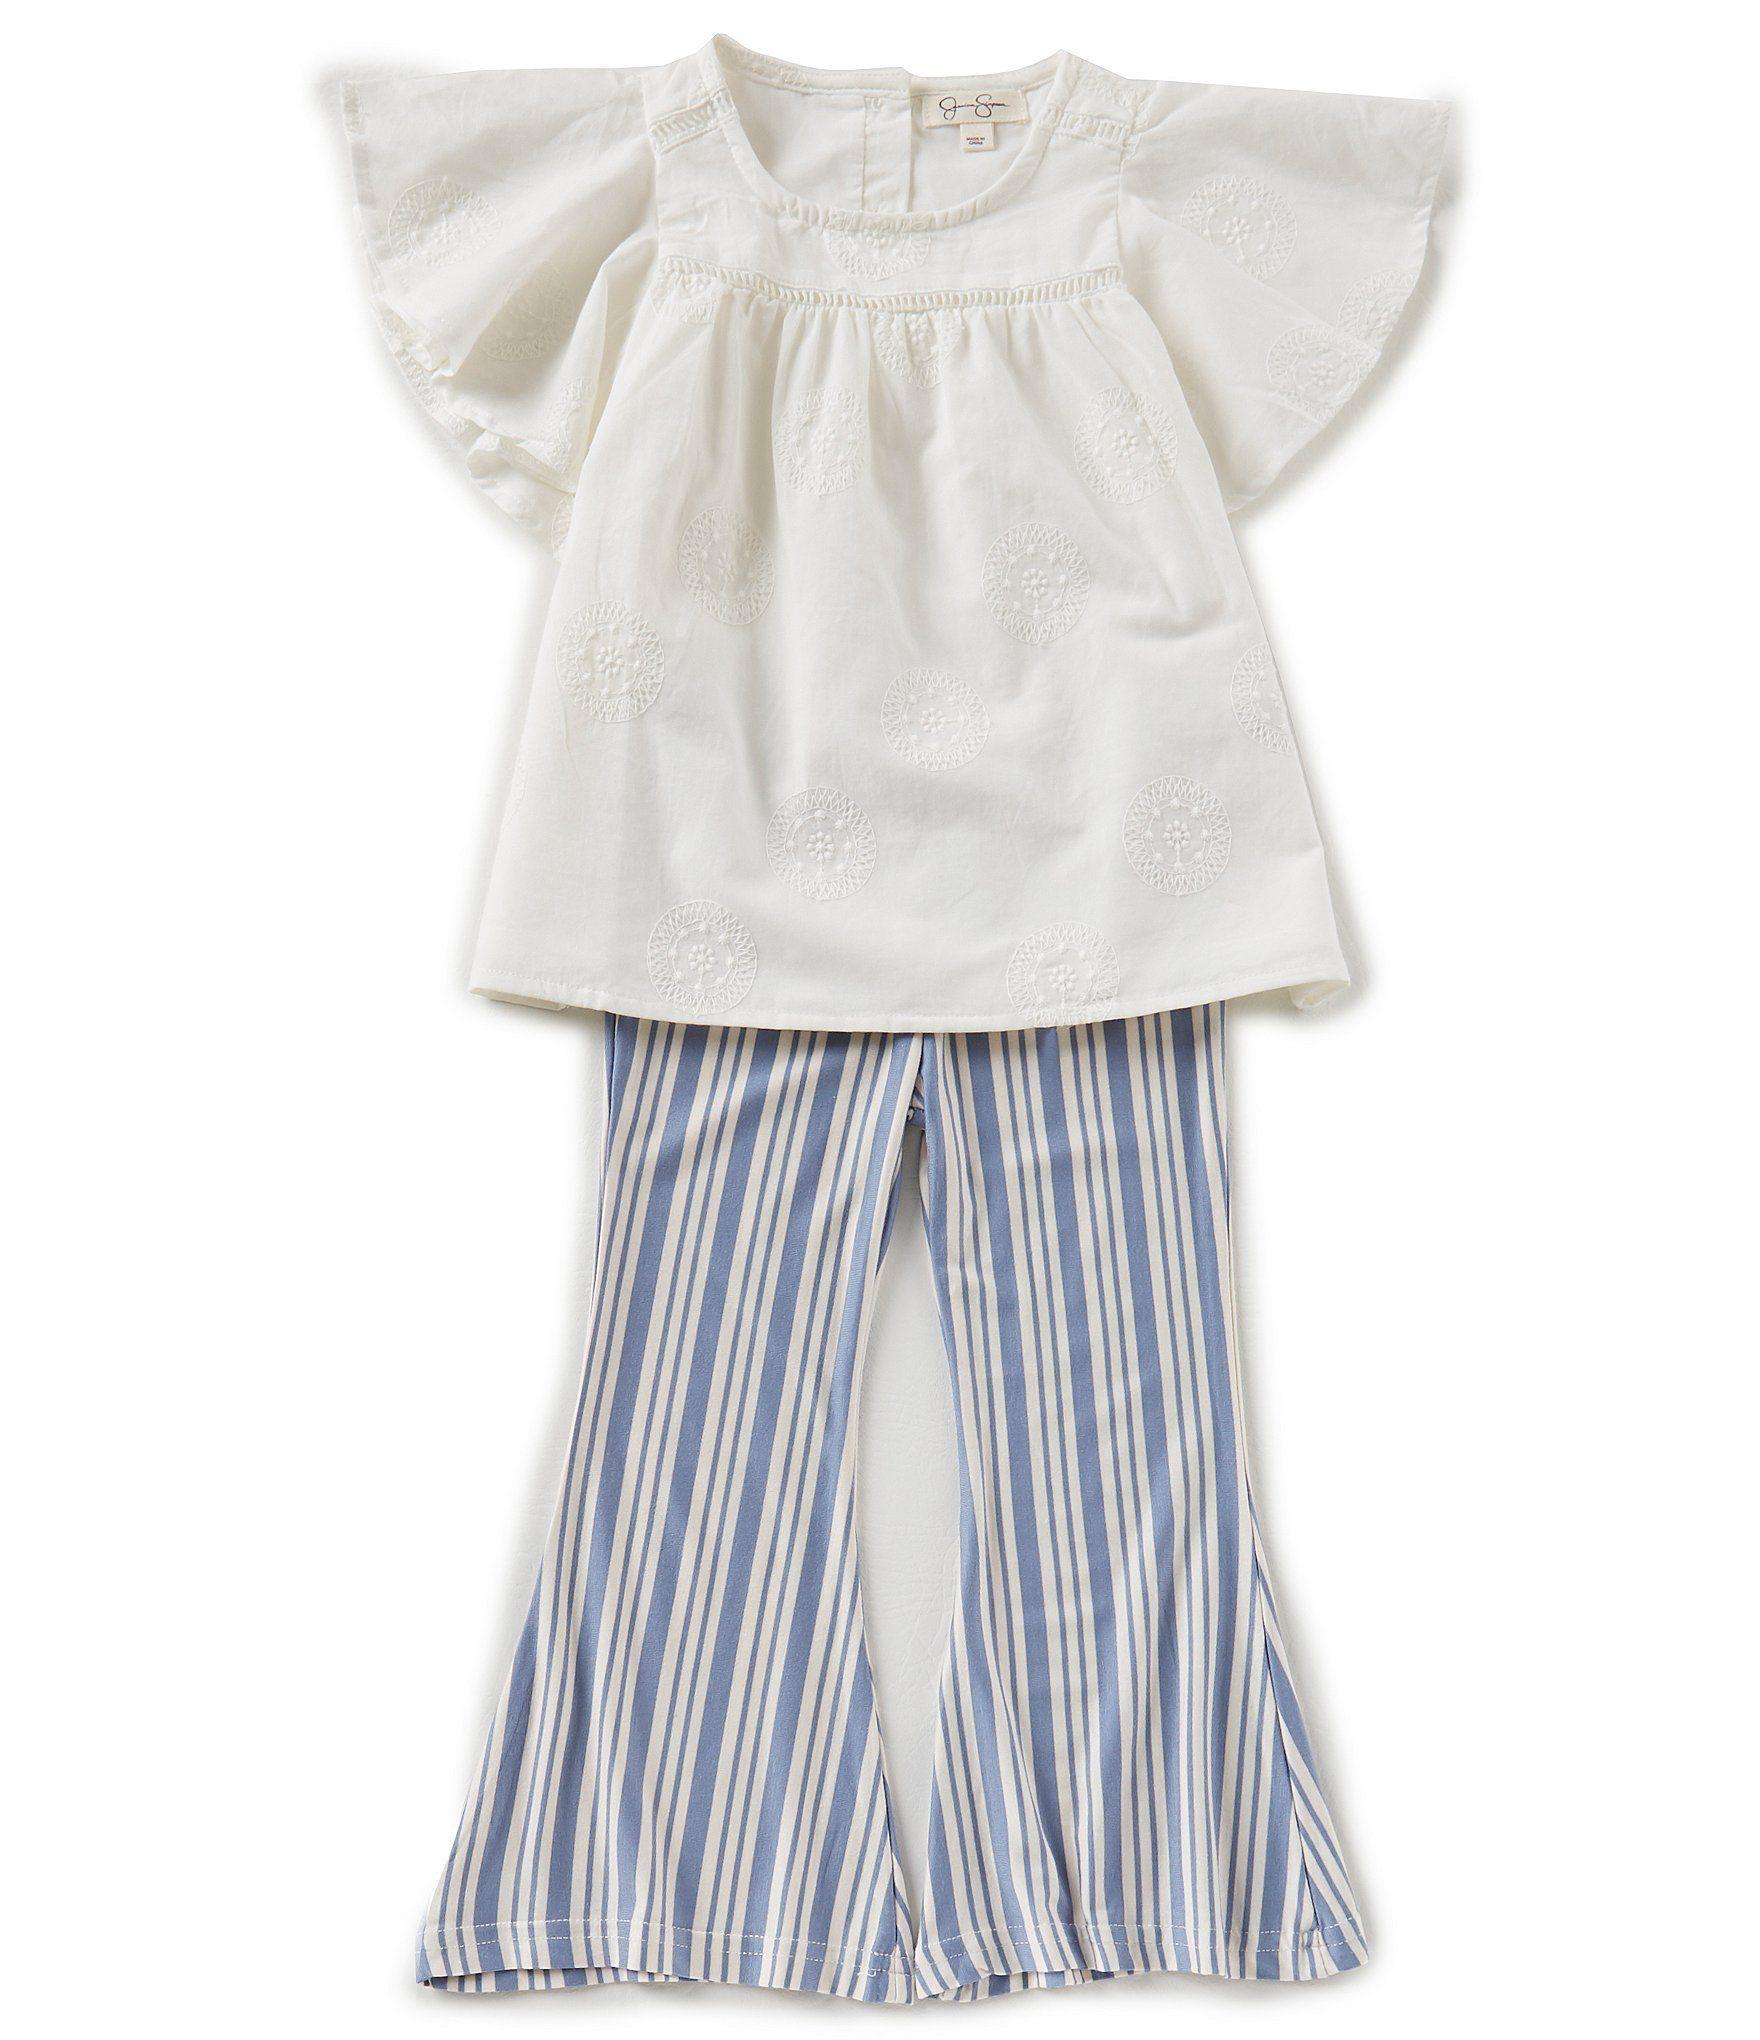 4cdc5c7944d4 Jessica Simpson Little Girls 2T6X Voile FlutterSleeve Top and Striped Bell  Bottom Pants Set  Dillards